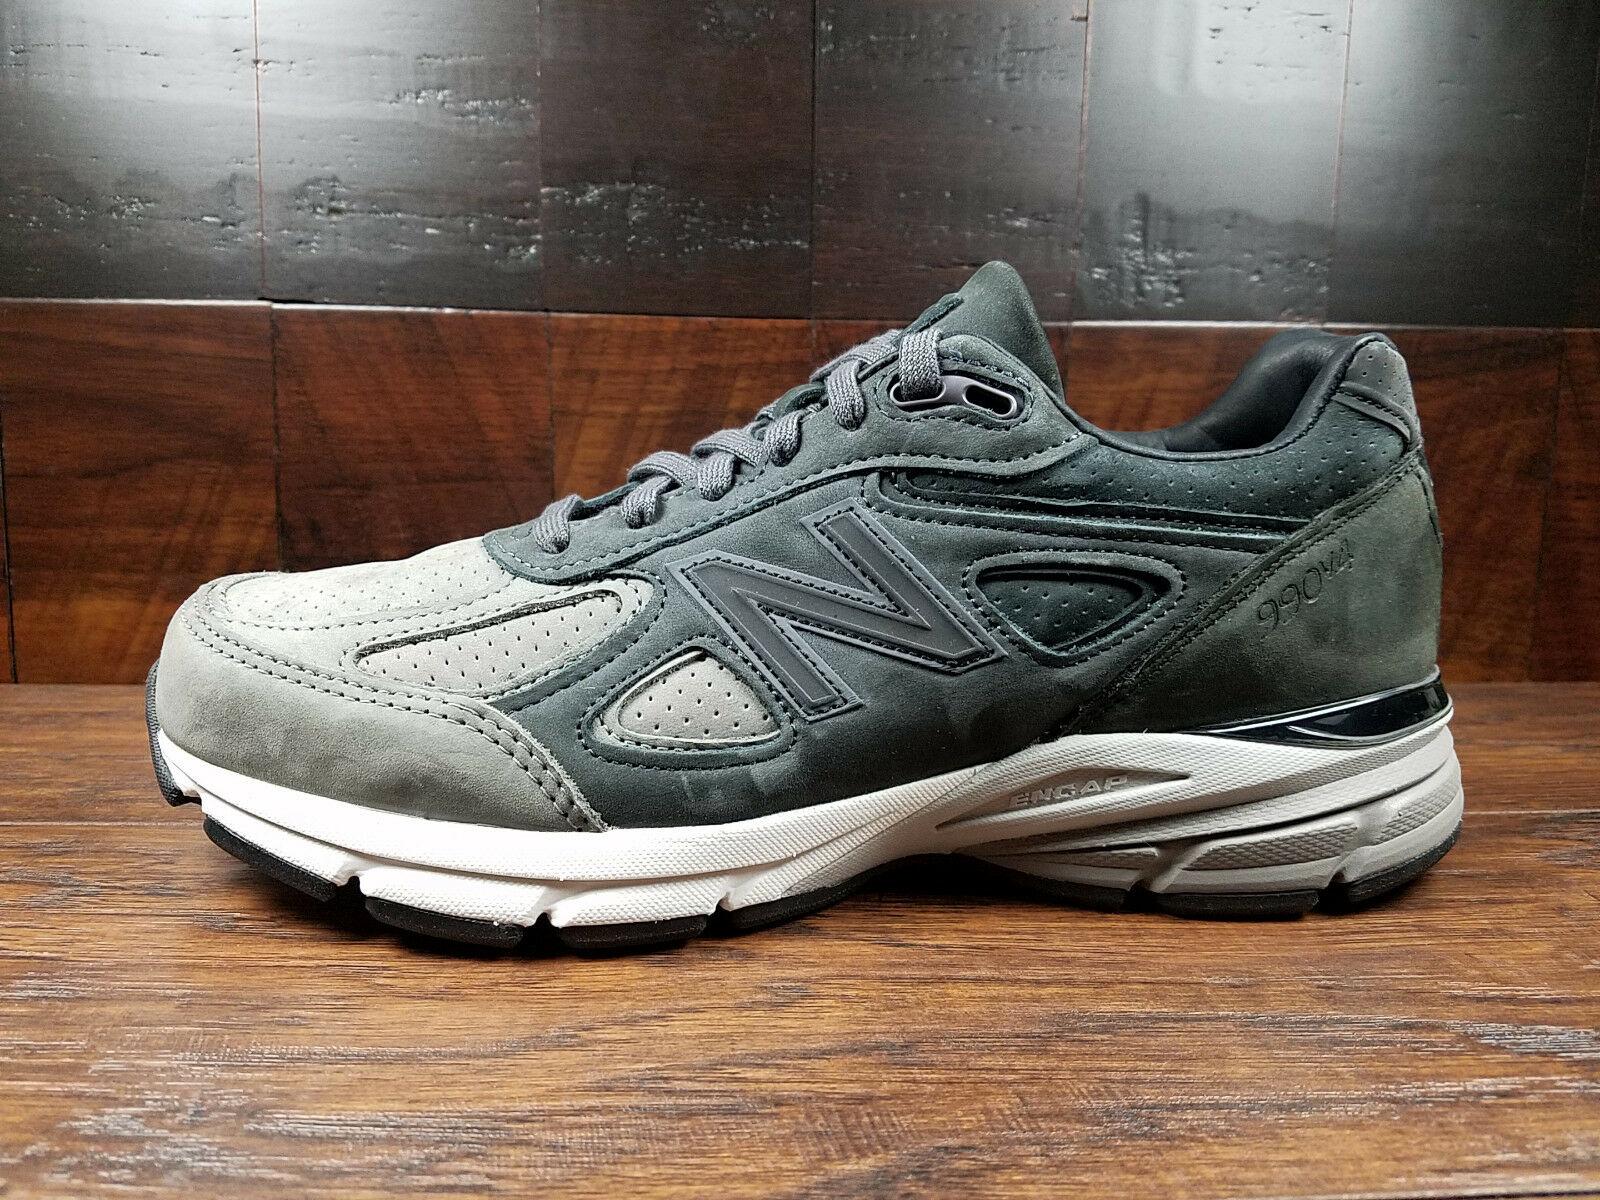 New Balance M990FEG4 Premium Nubuck -FINAL EDITION- 990v4 (Grey   Black) USA